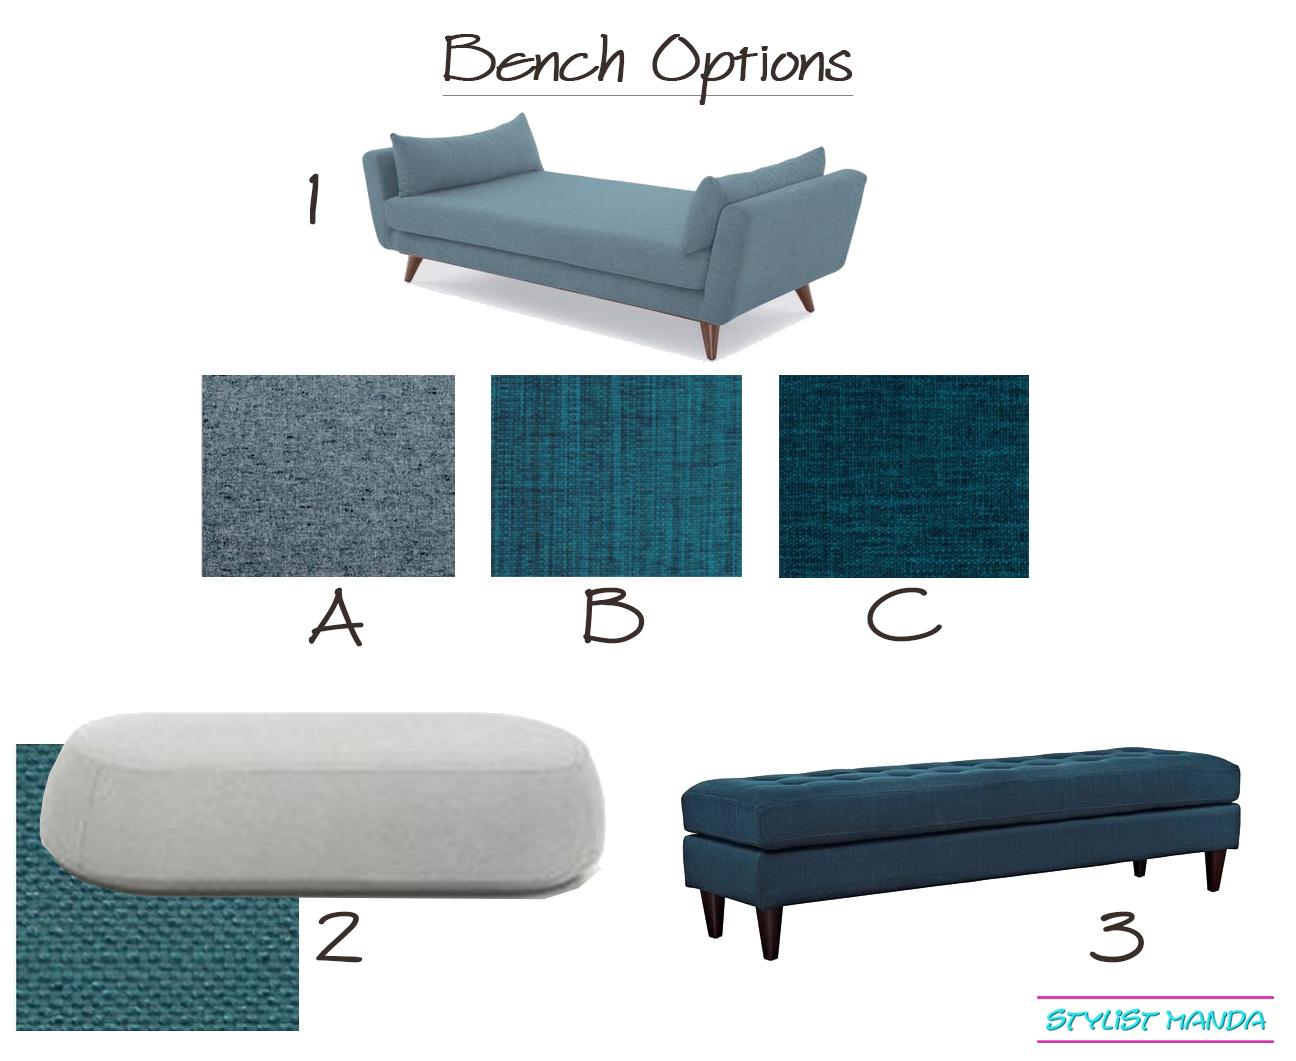 bench options.jpg